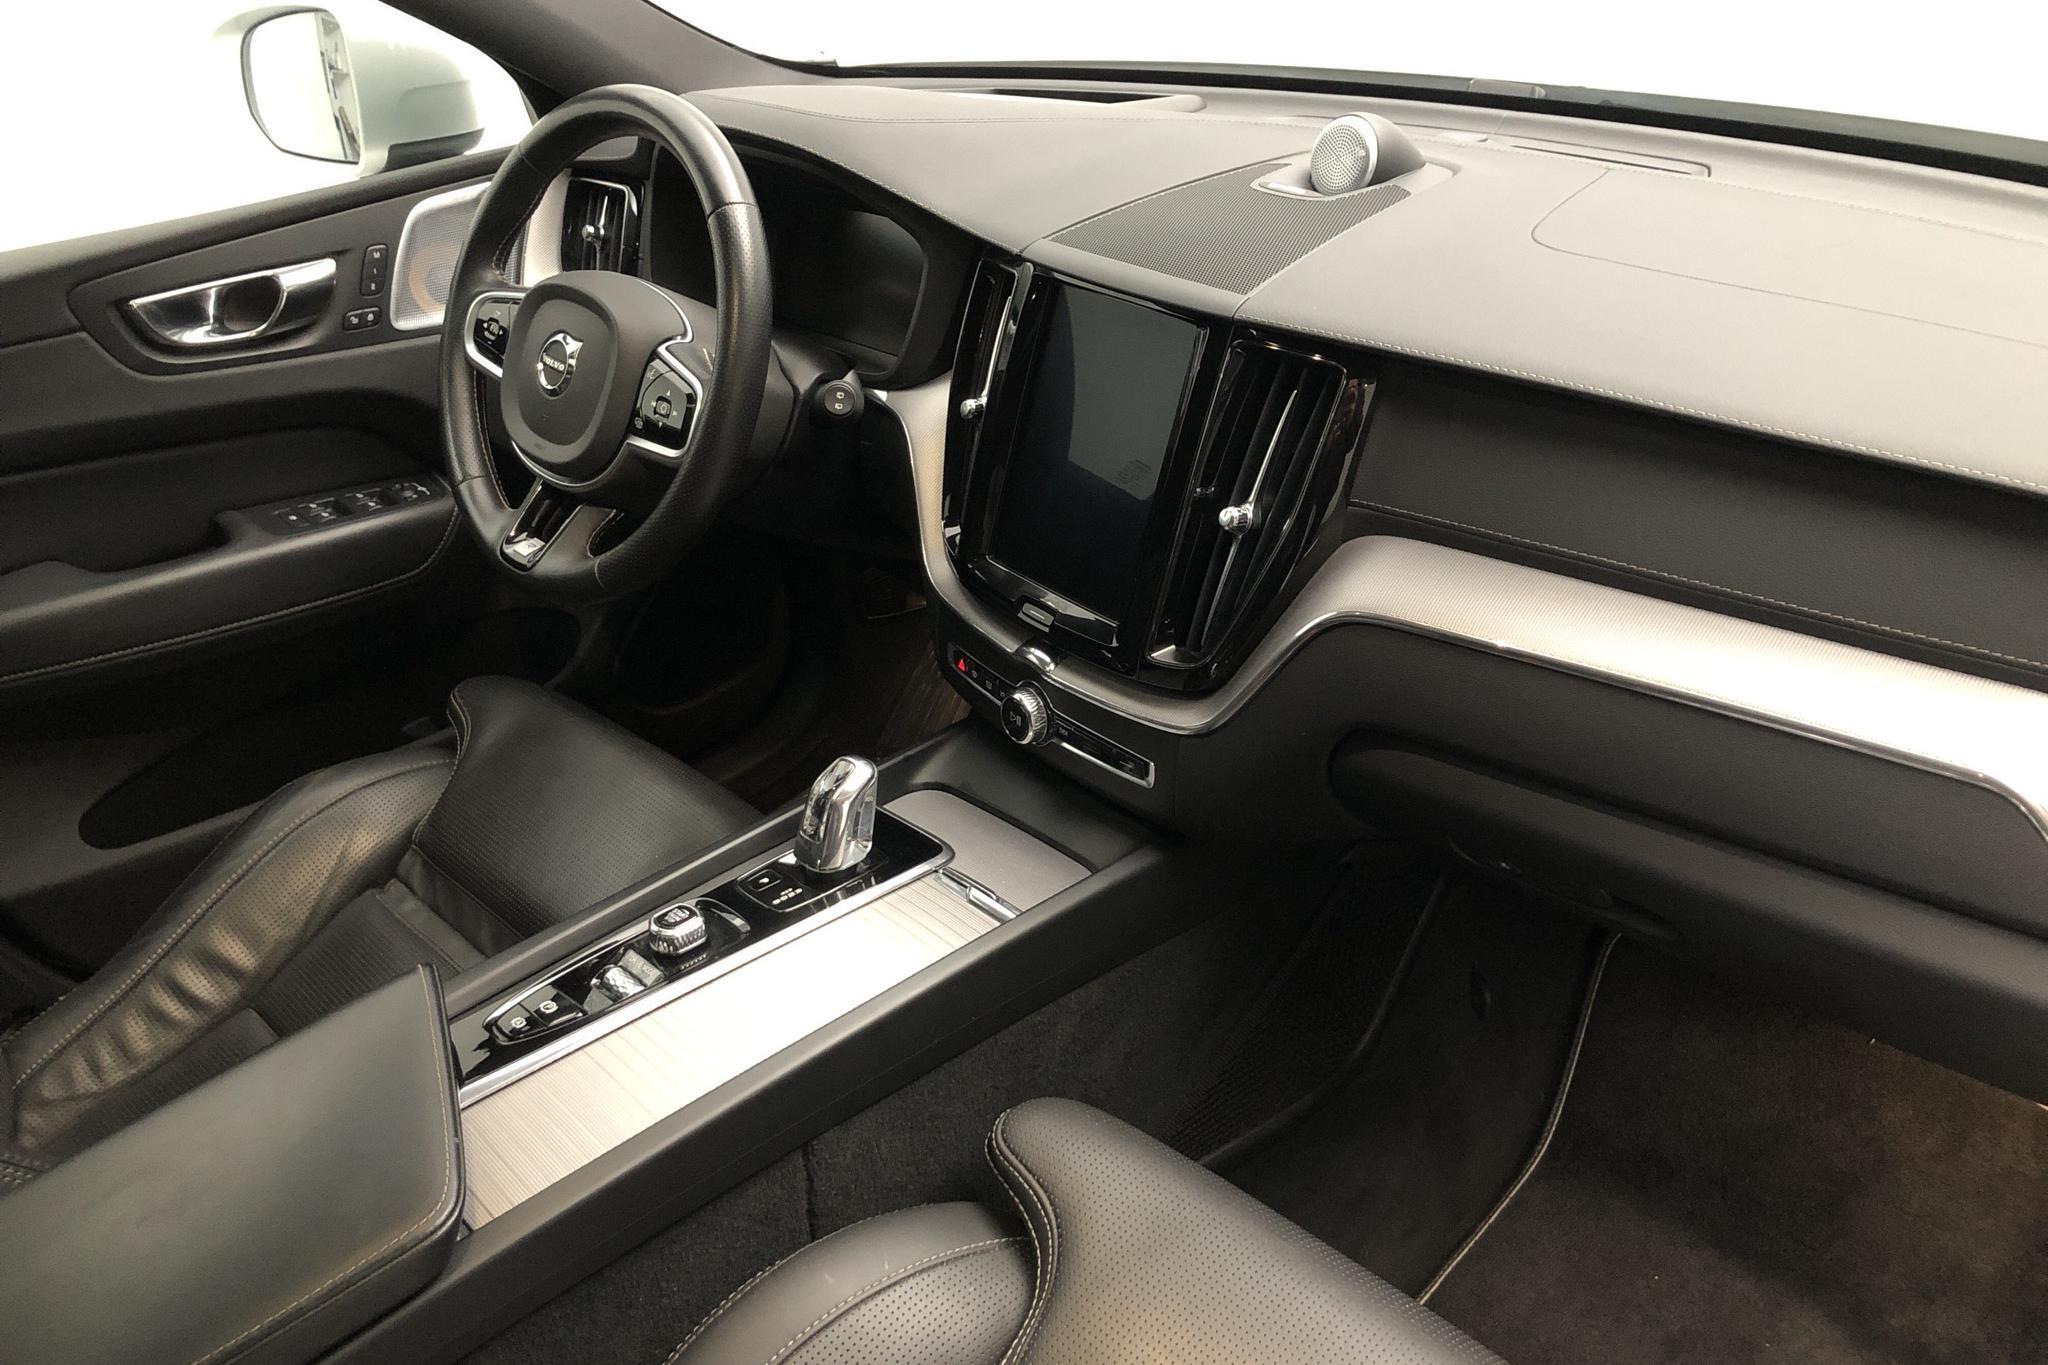 Volvo XC60 T8 AWD Twin Engine (390hk) - 72 700 km - Automatic - white - 2019